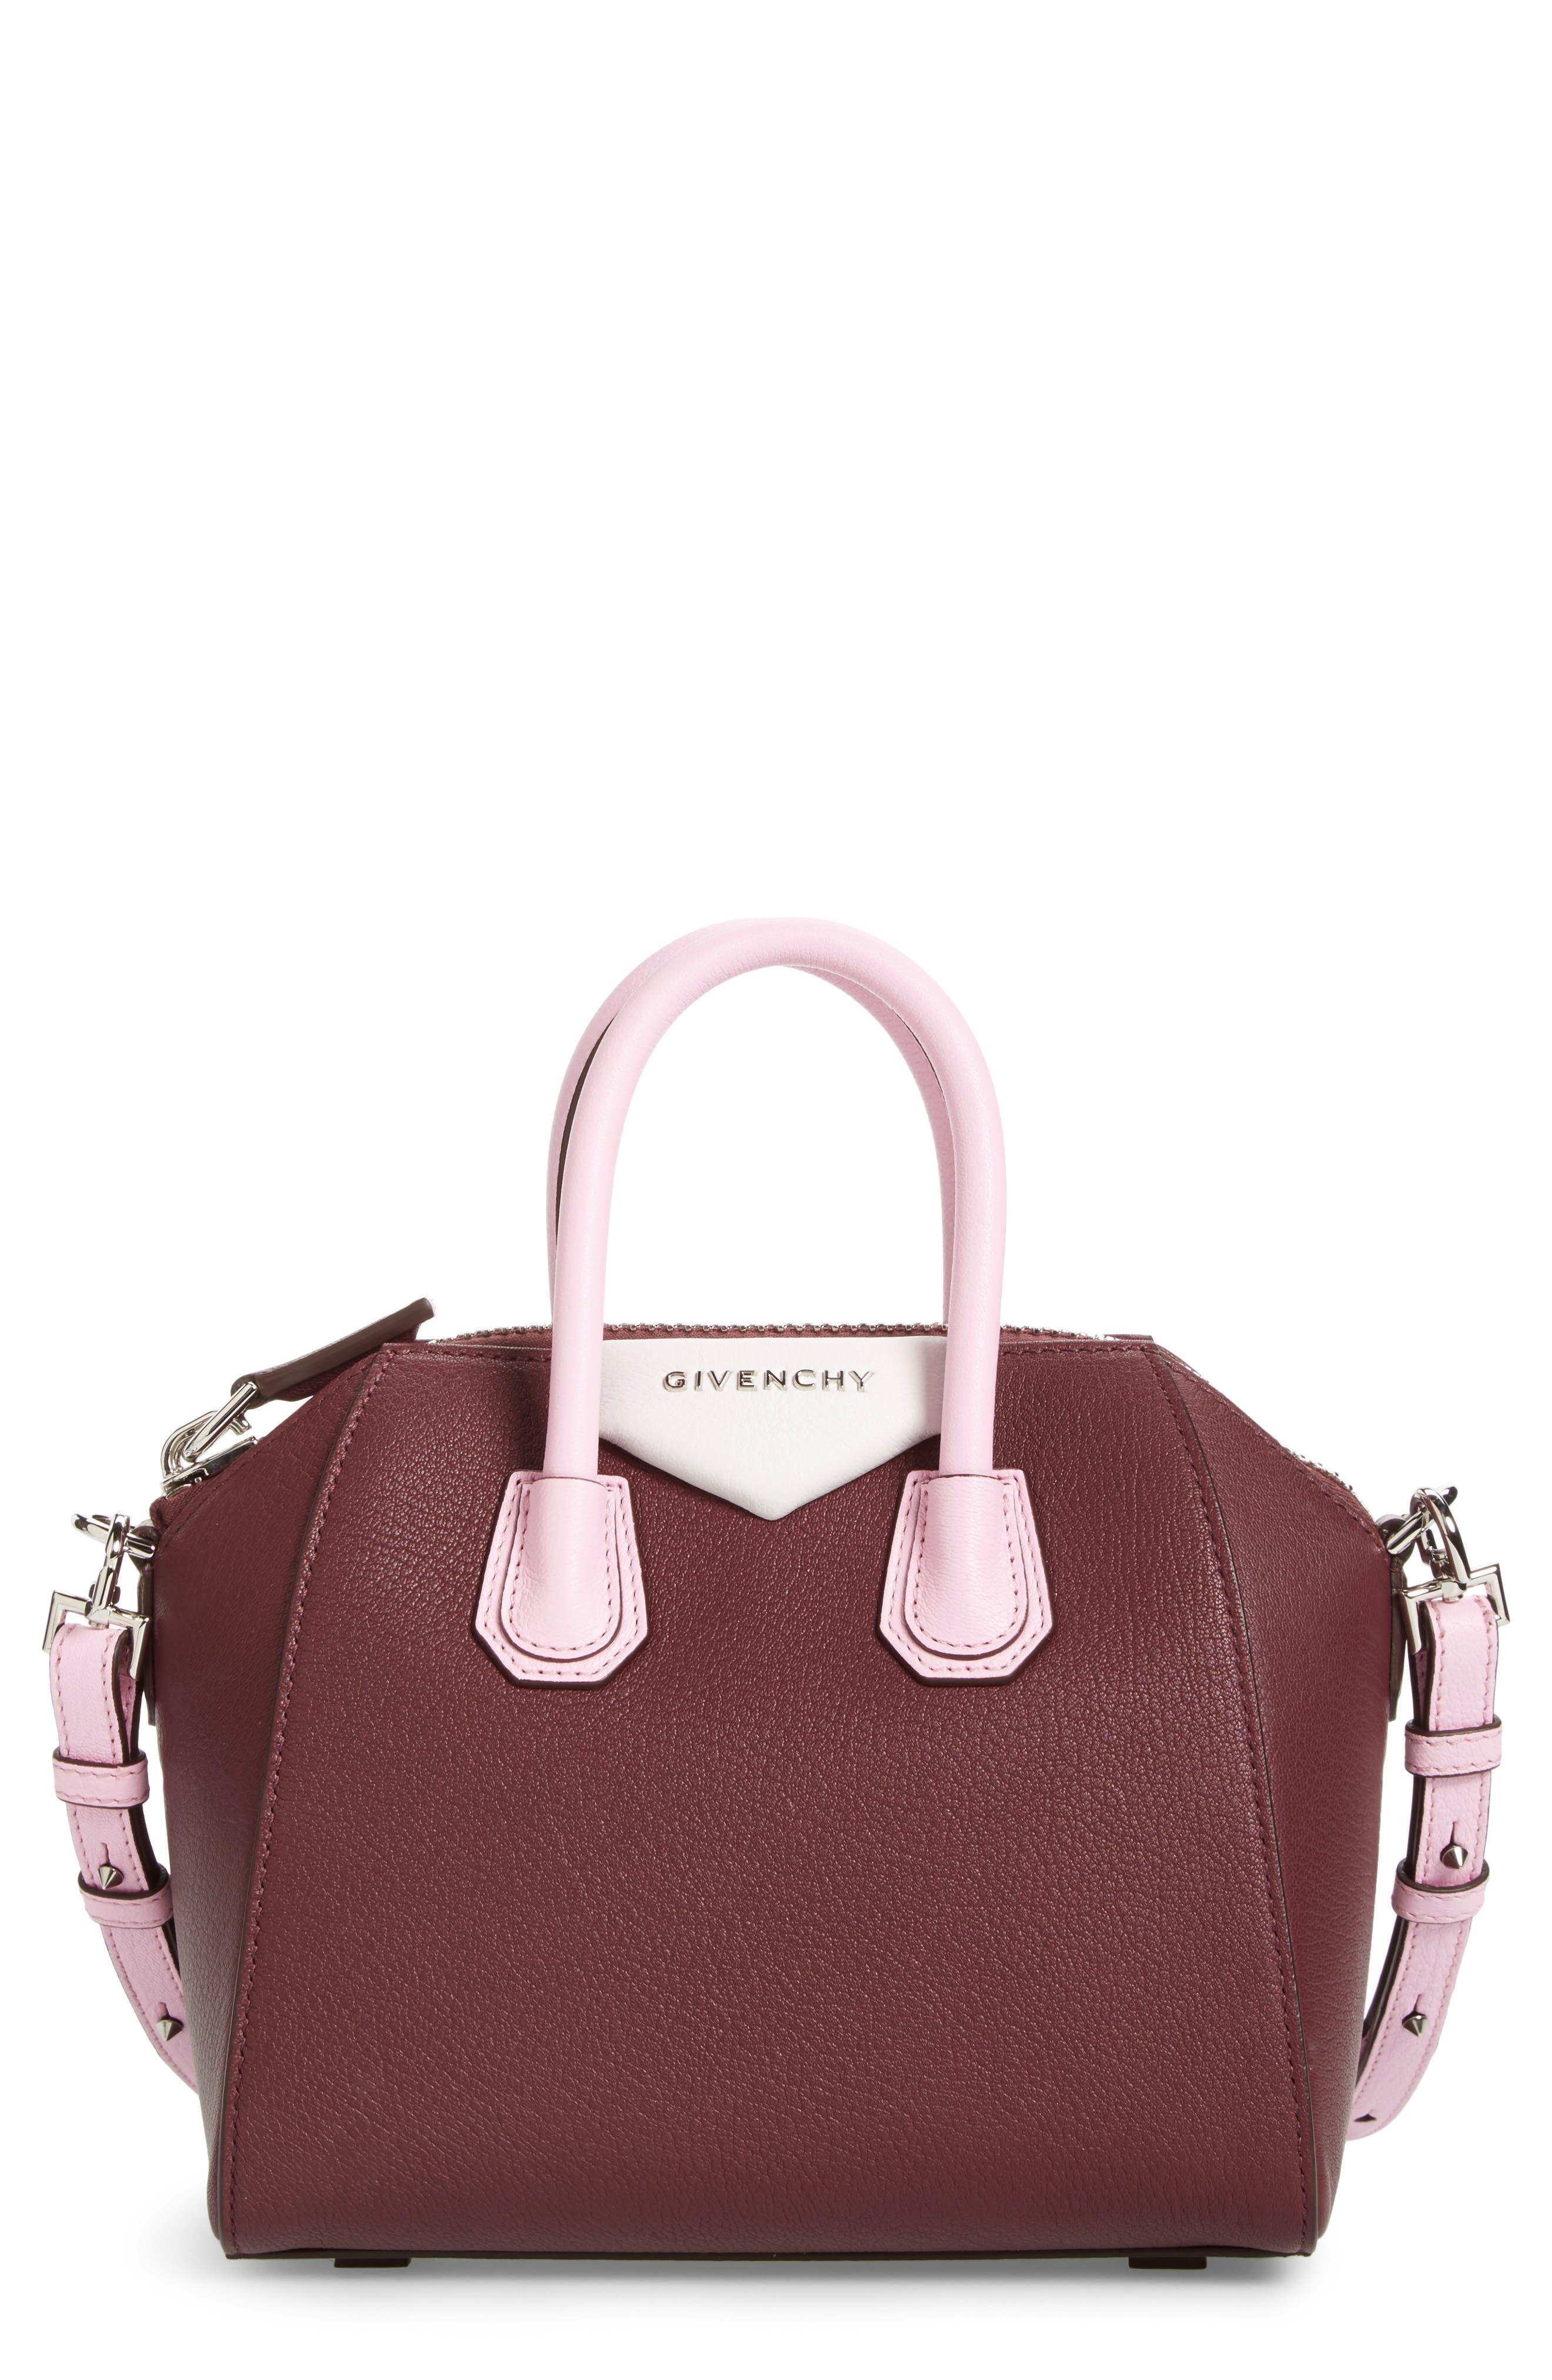 Mini Antigona Leather Top Handle Satchel,                         Main,                         color, Burgundy/ Pink